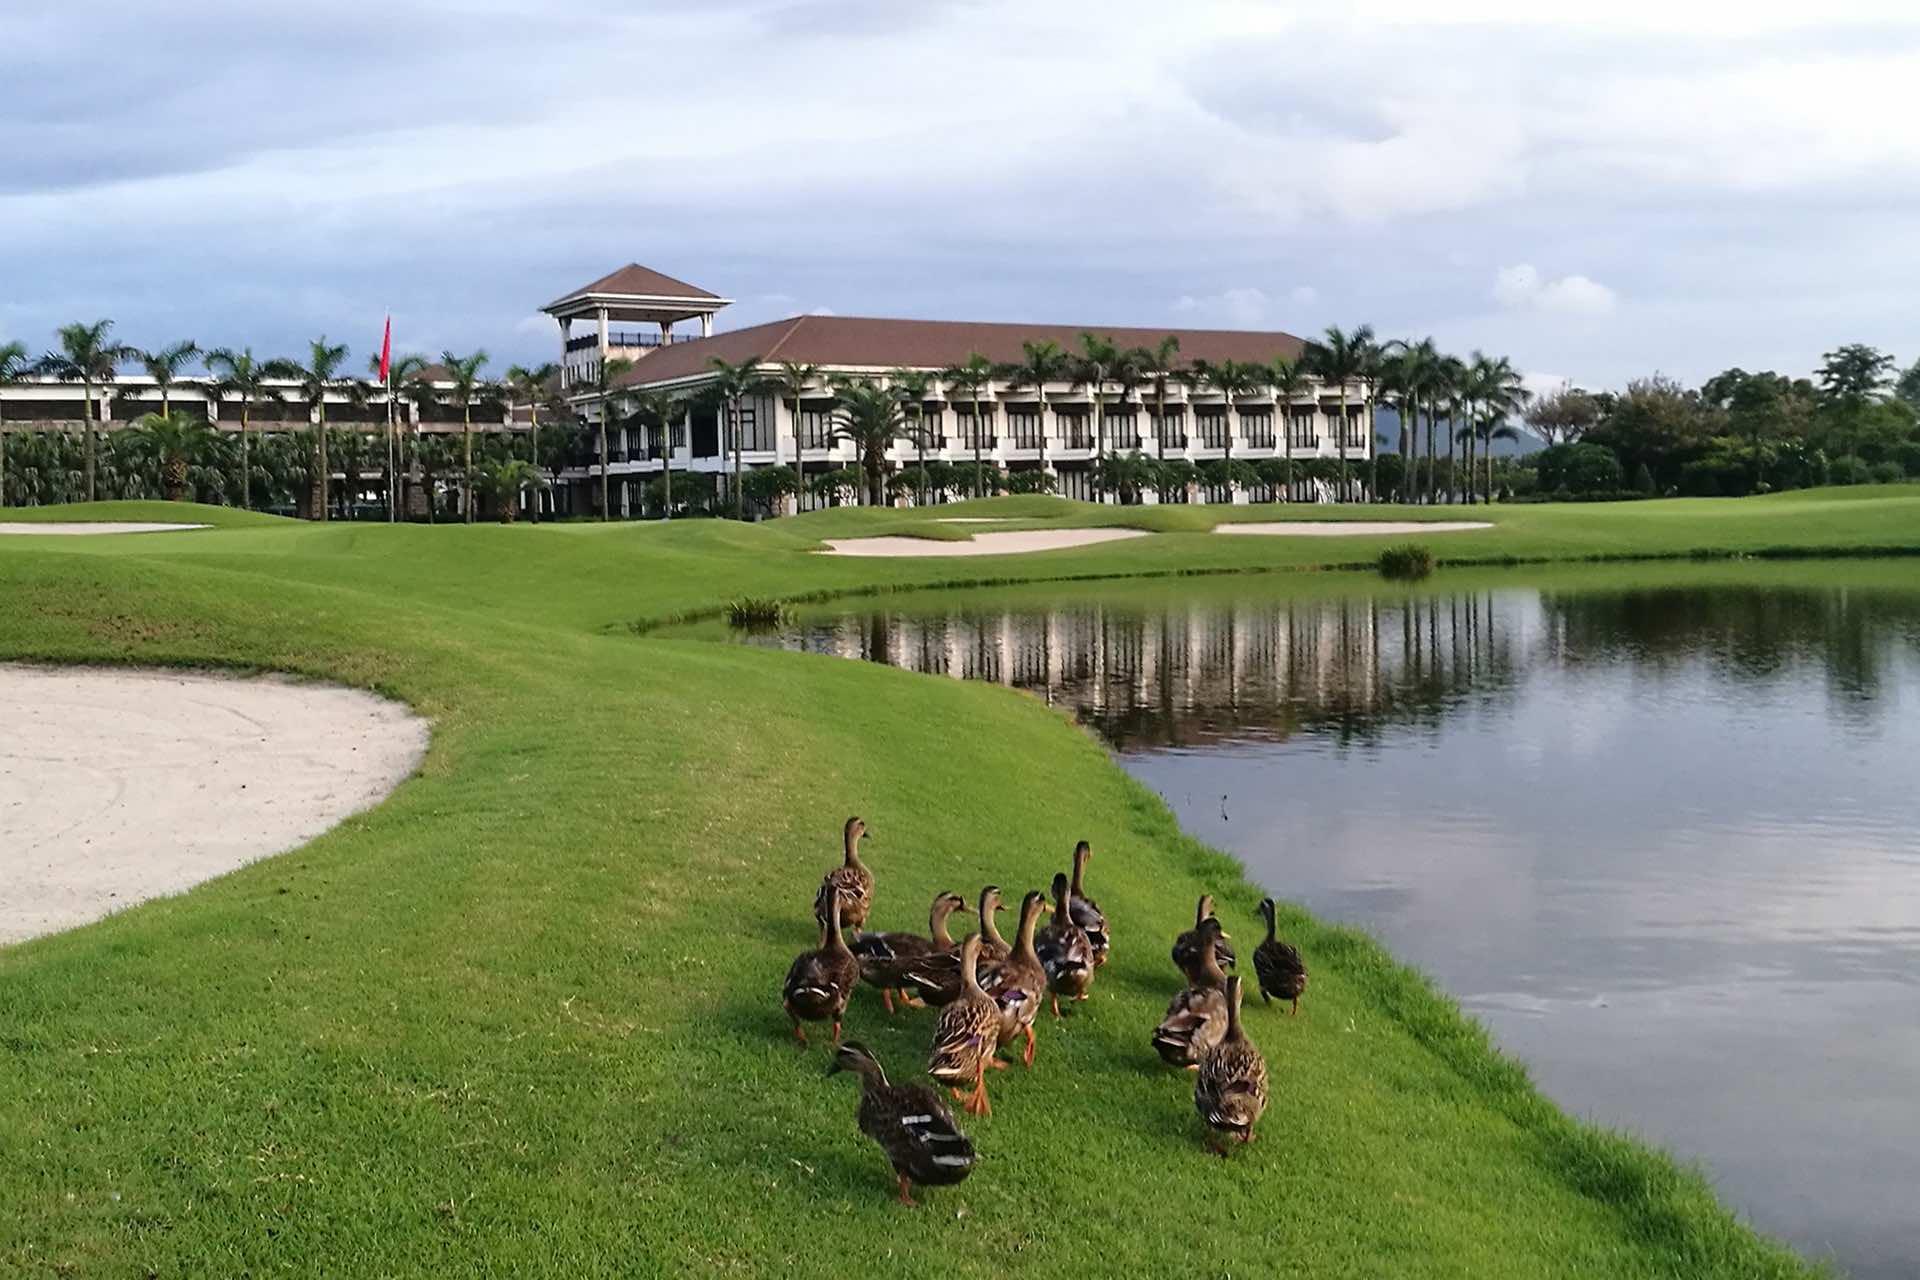 2019 Southern Junior Venue Spotlight featuring Zhuhai Golden Gulf Golf Club